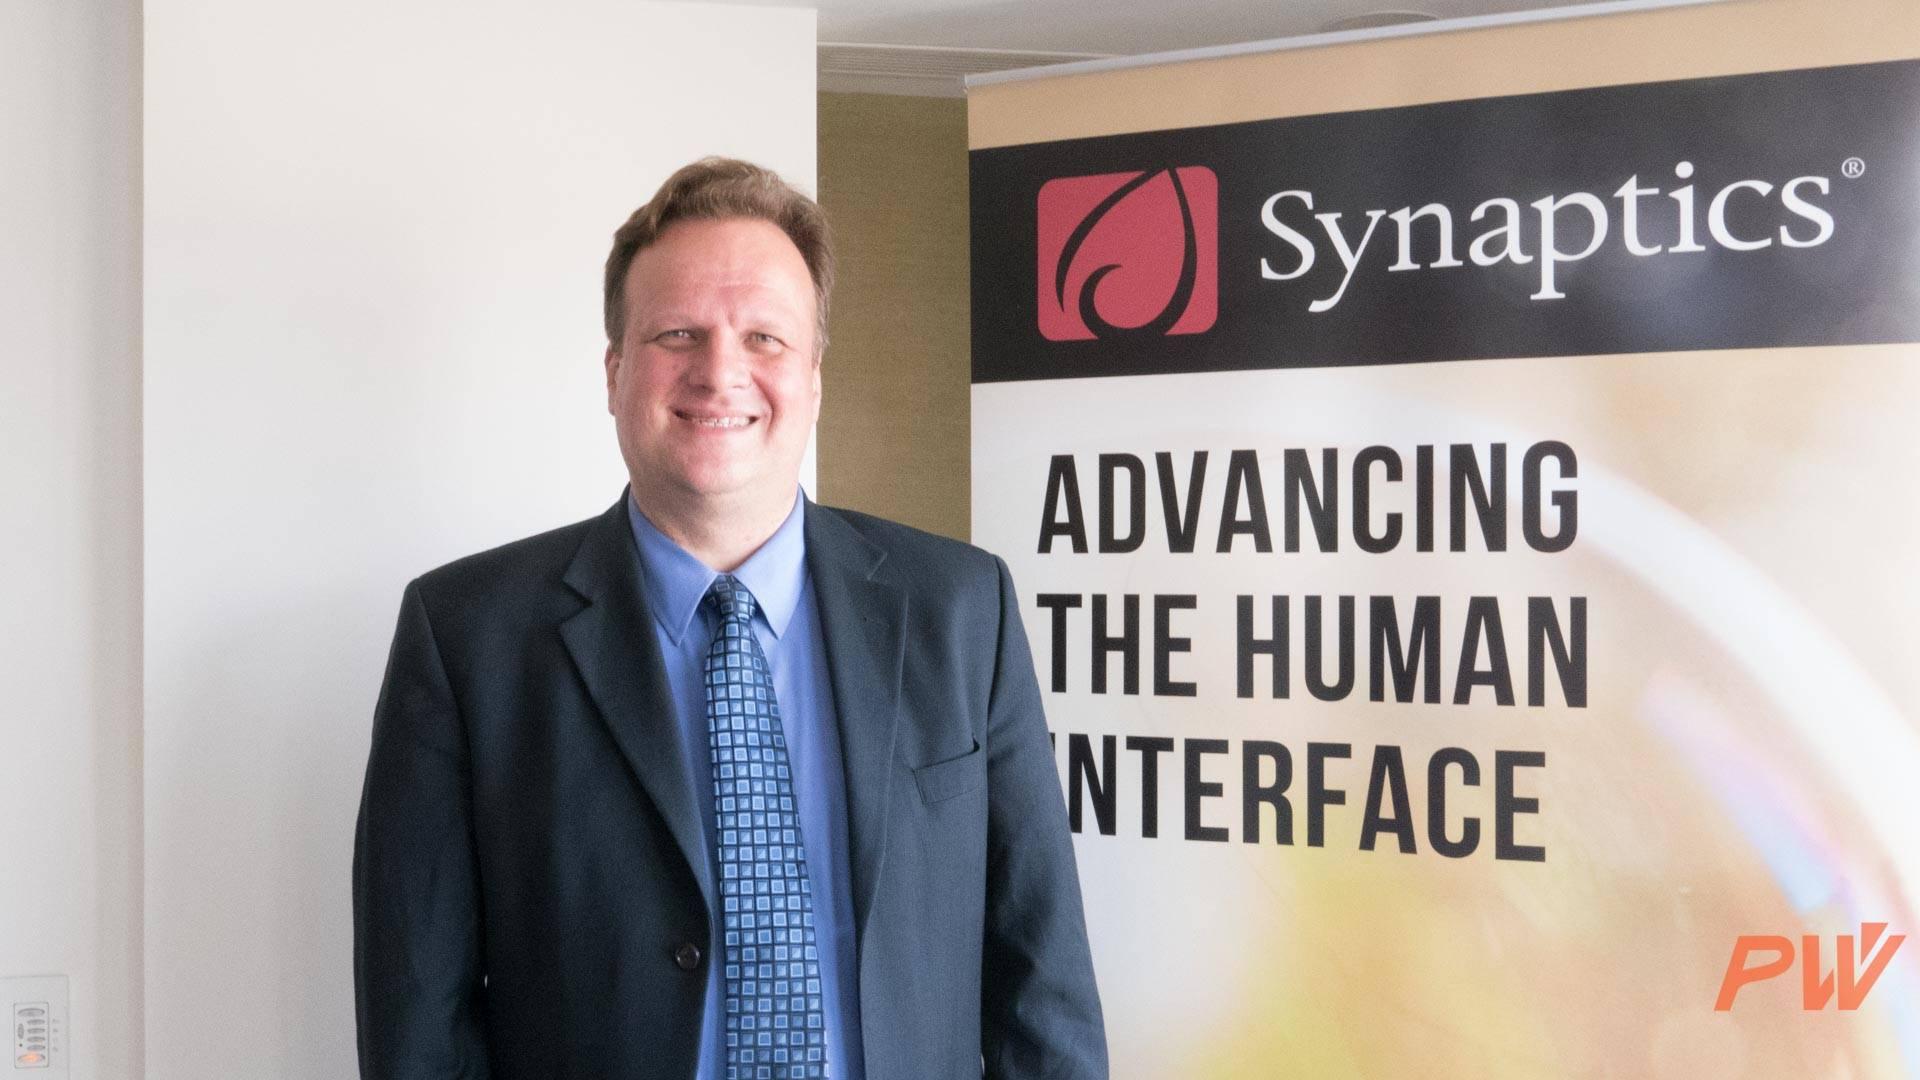 Synaptics 人机界面解决方案部门高级副总裁 Huibert Verhoeven